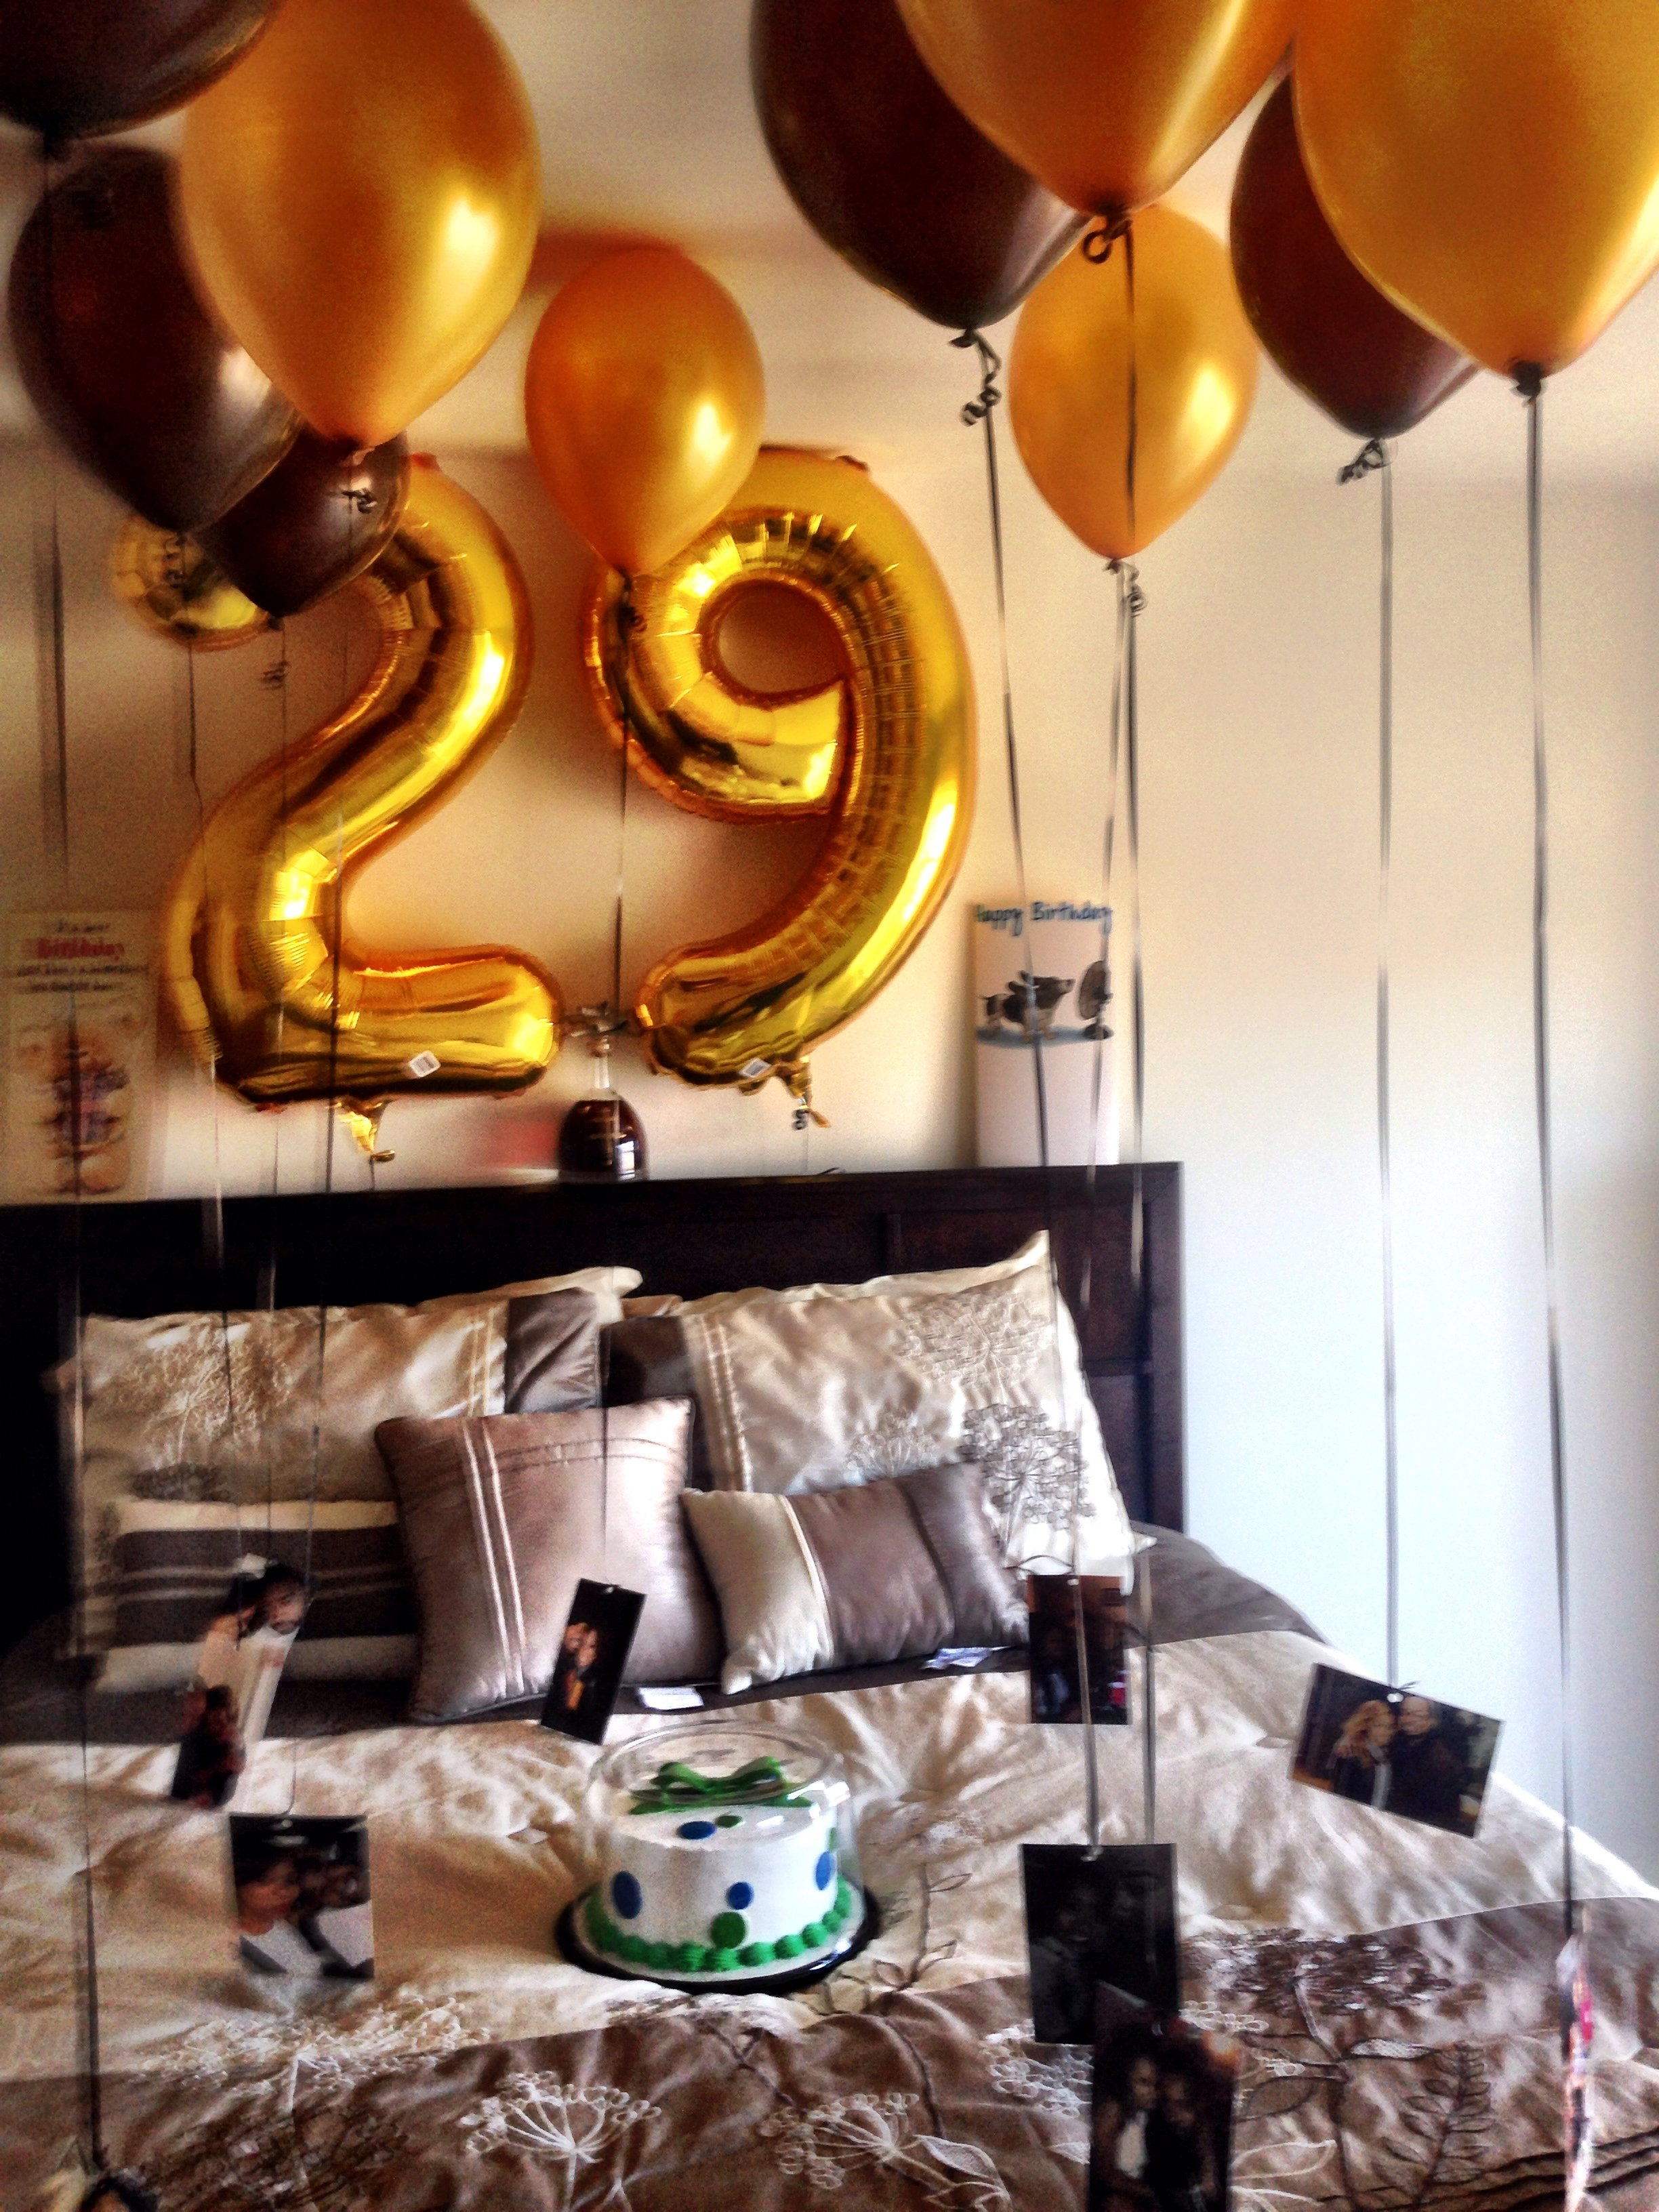 10 Most Popular Romantic Ideas For His Birthday boyfriends birthday birthdays pinterest boyfriends birthdays 7